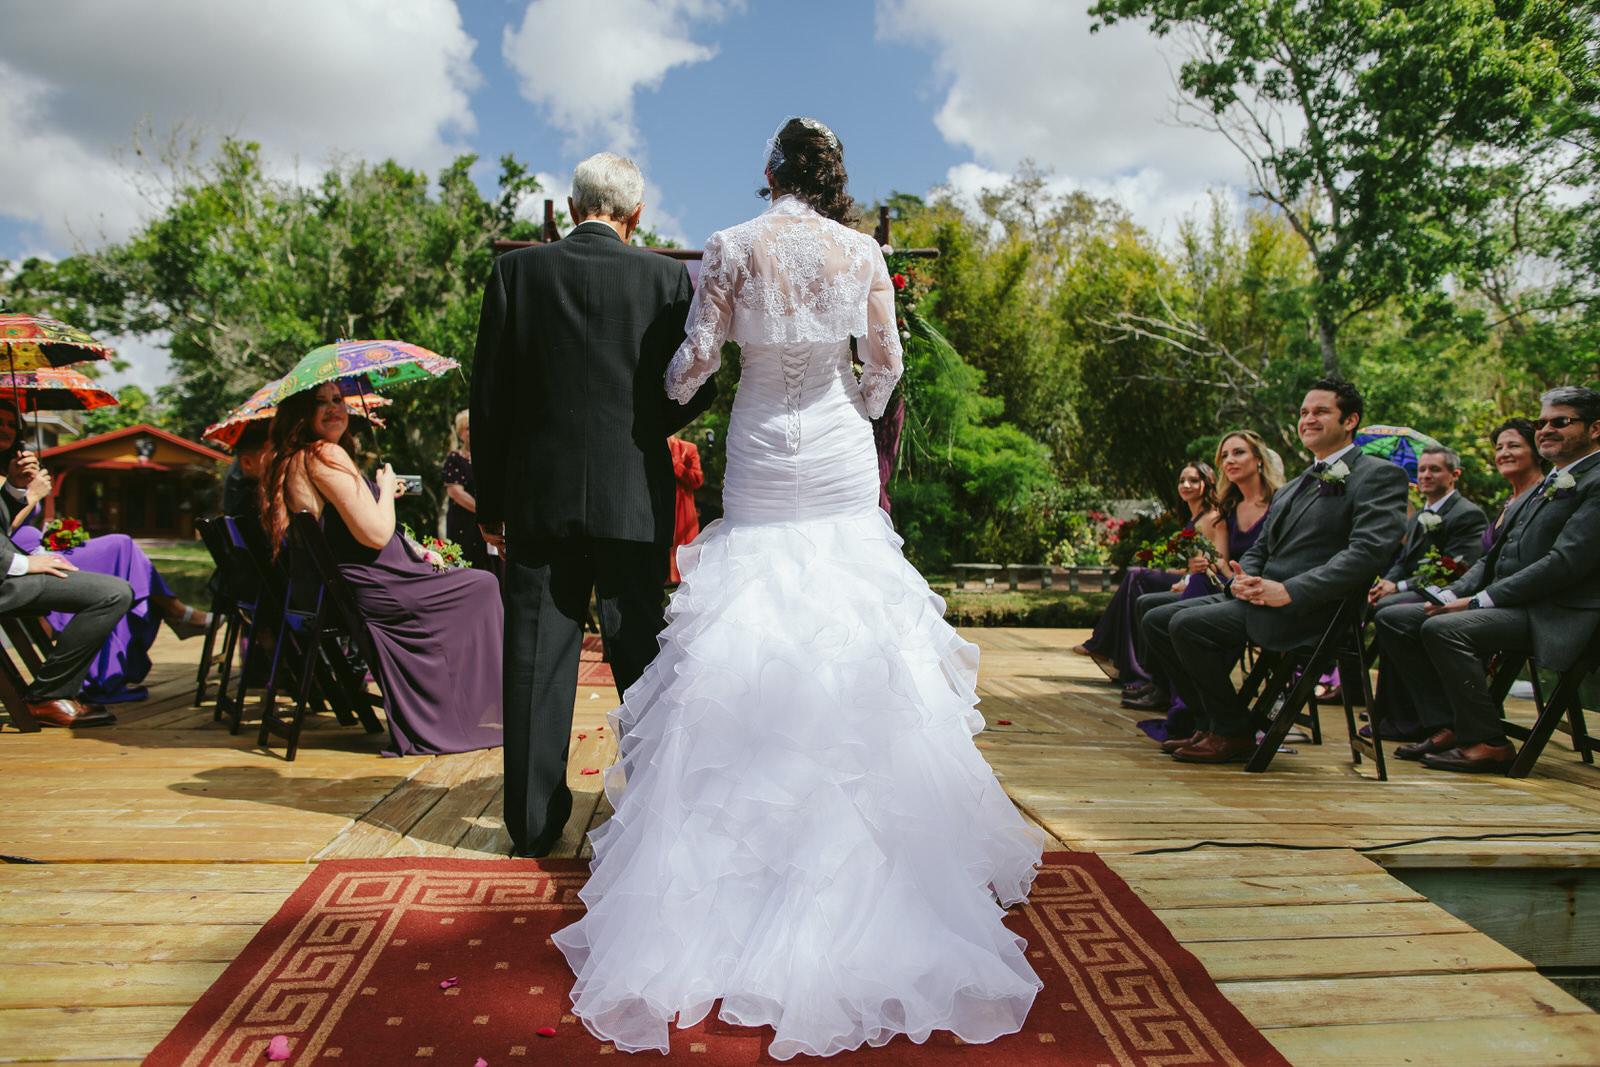 kashi-ashram-wedding-ceremony-sebastian-florida-tiny-house-photo-3.jpg